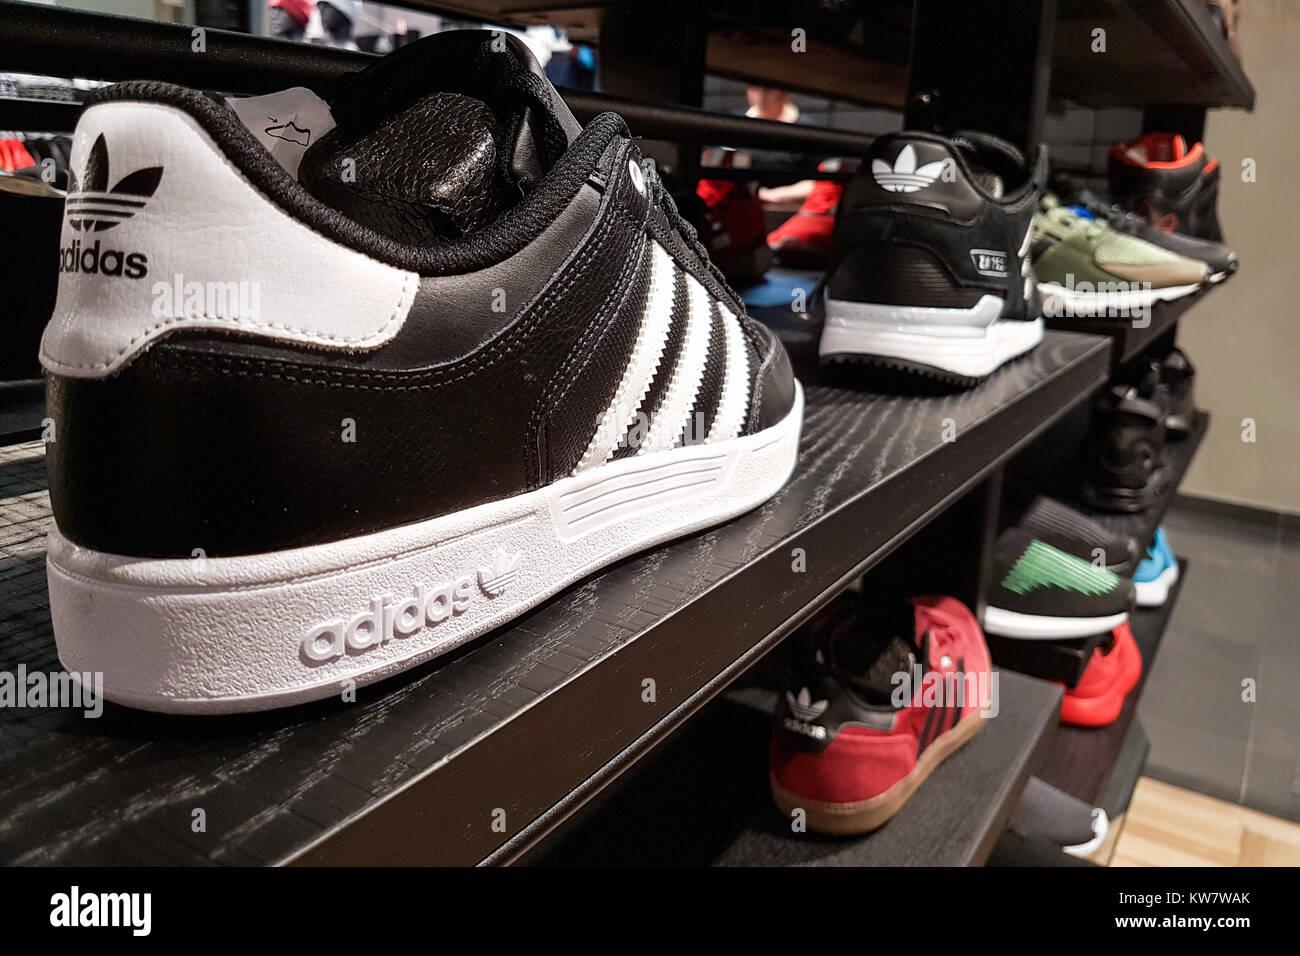 Alamy Schuhe Stockfotosamp; Adidas Schuhe Bilder Adidas JFK1cTl